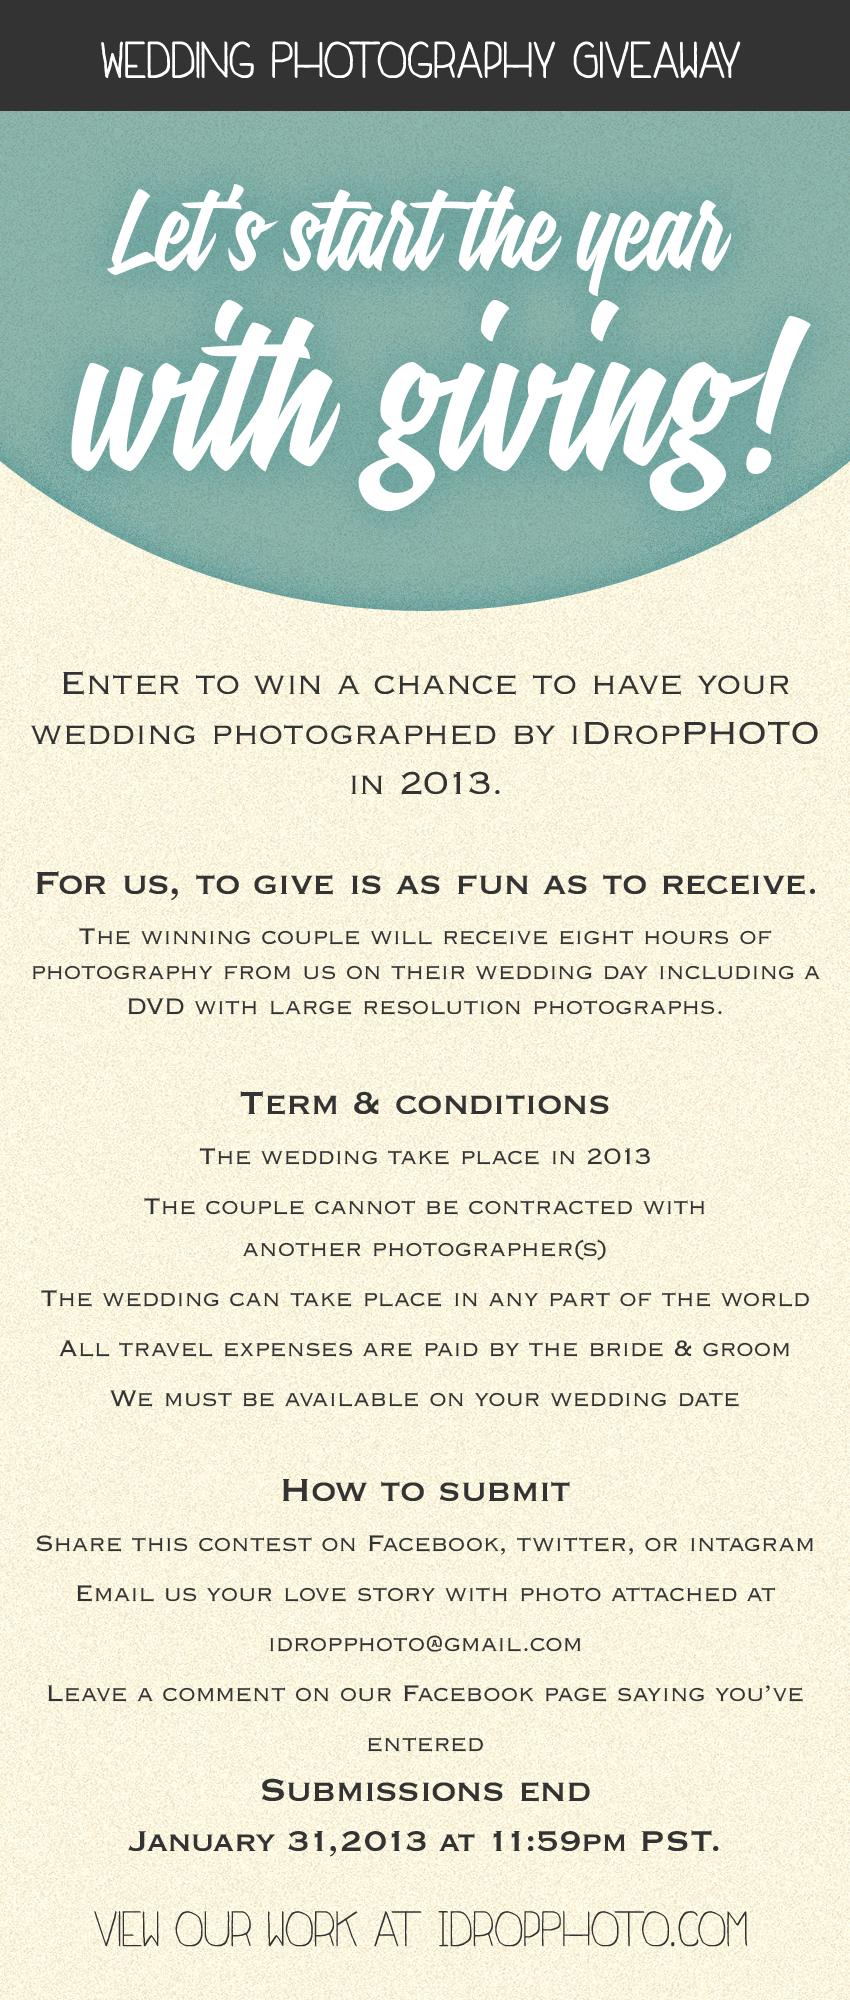 iDropPhoto wedding photography giveaway